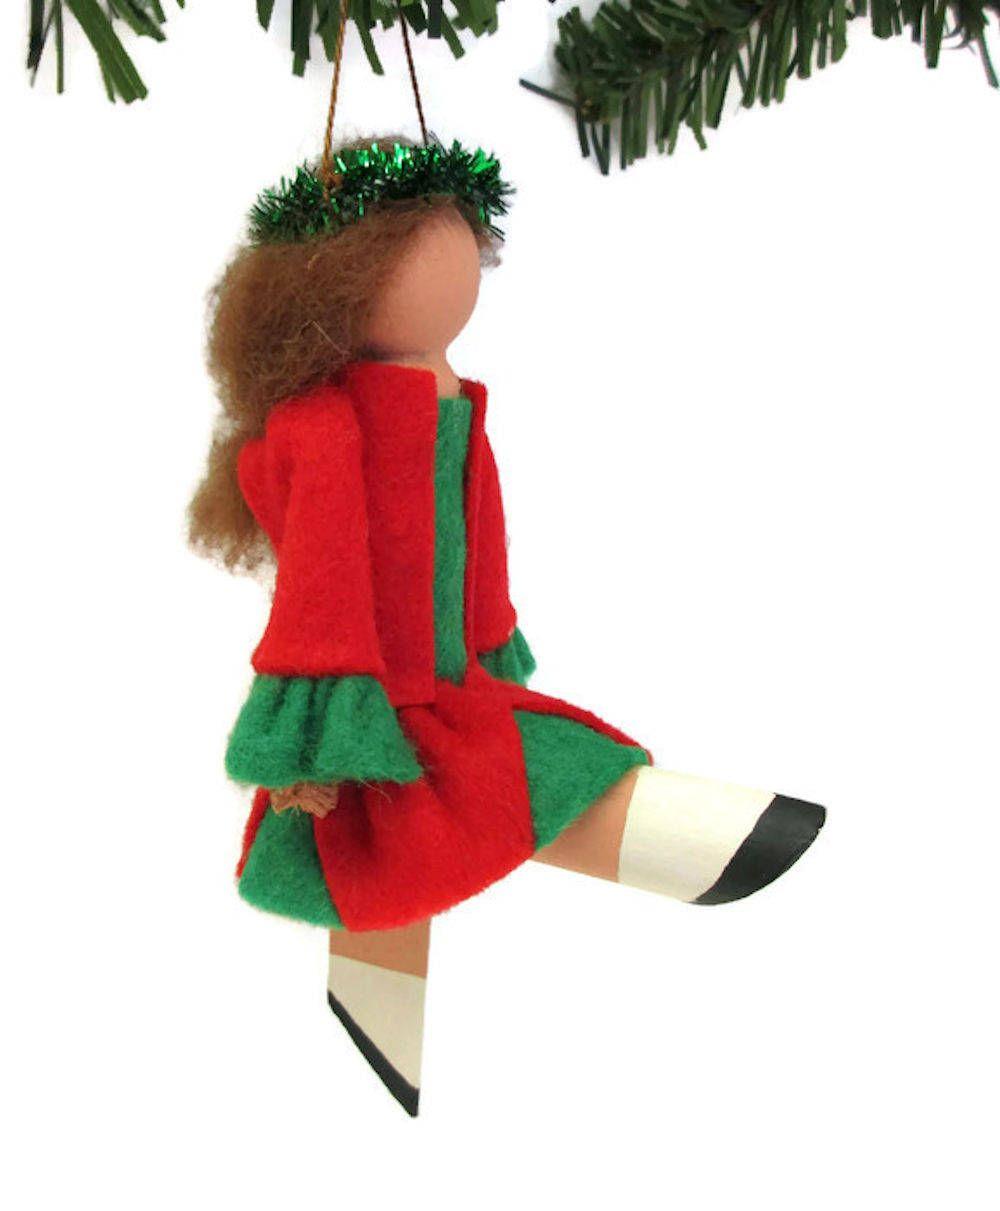 Irish Dancer Christmas Ornament, Clothespin Ornament, Peg Doll ...